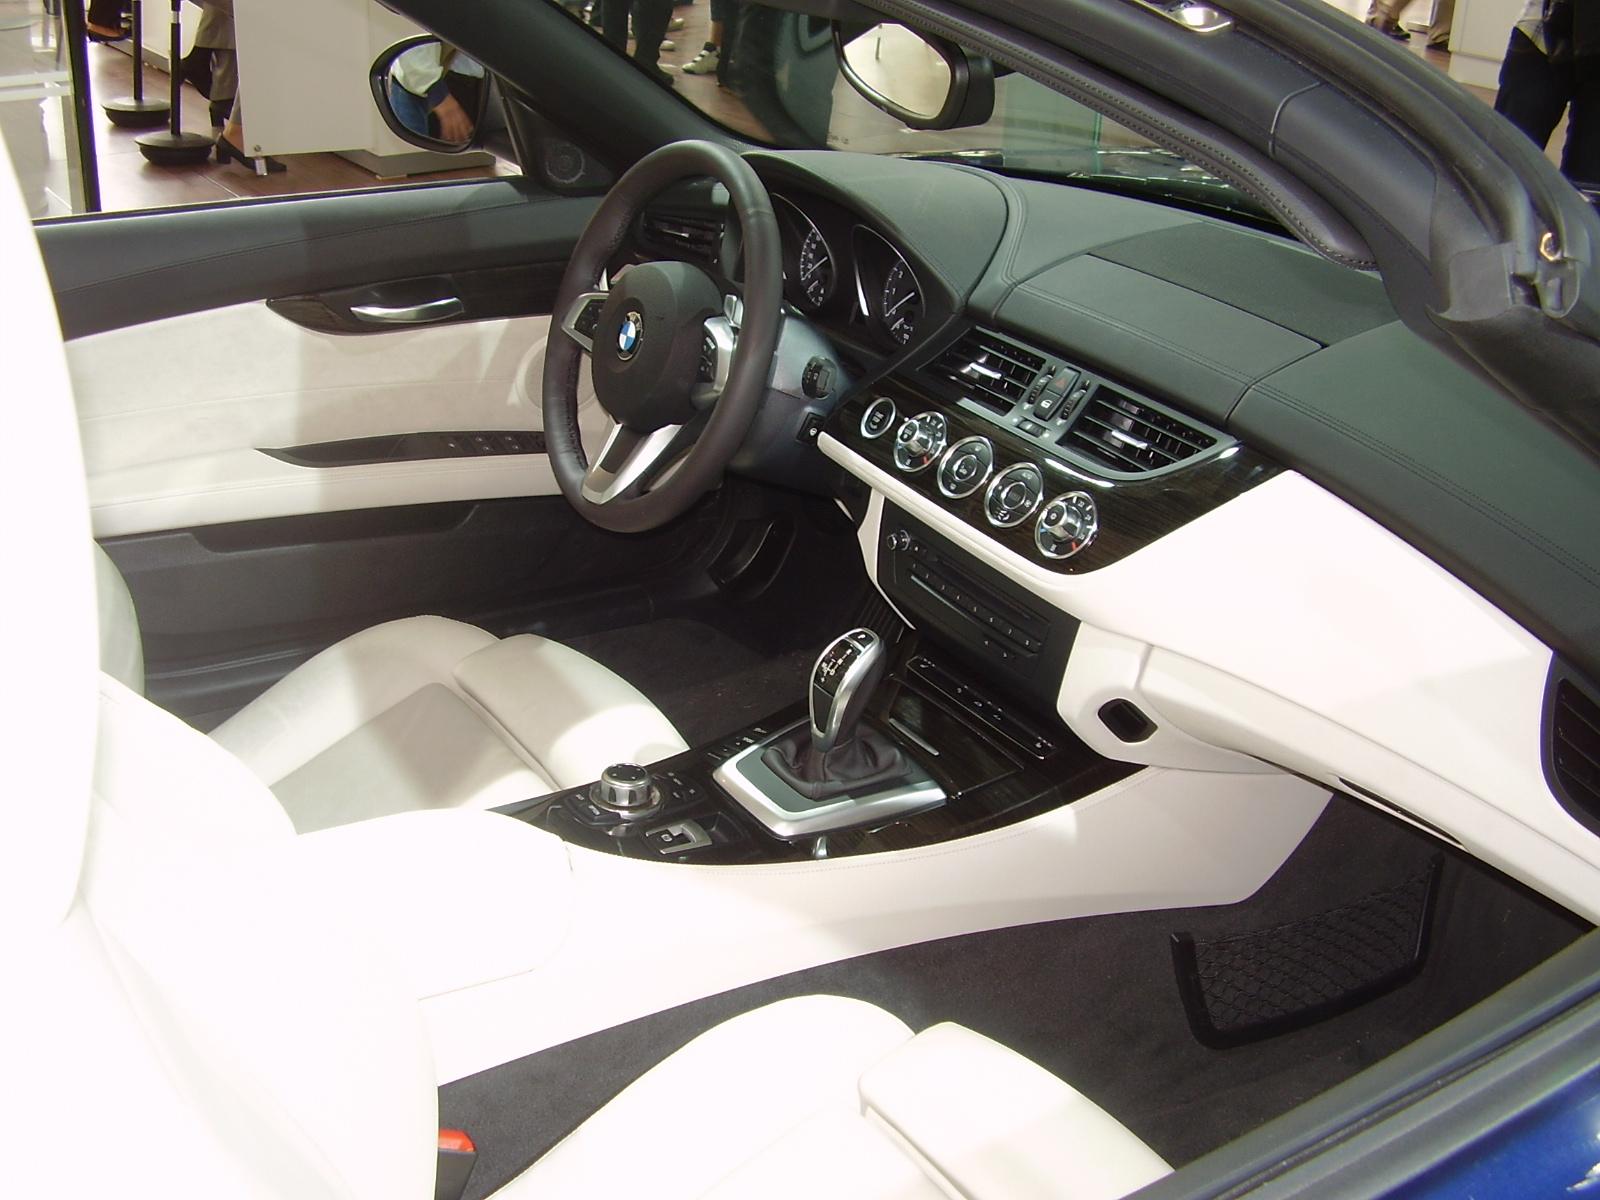 Visita Salon Automovil 09 BCN / Visit to Car Exhibition 09 Barcelona-P5140789.JPG